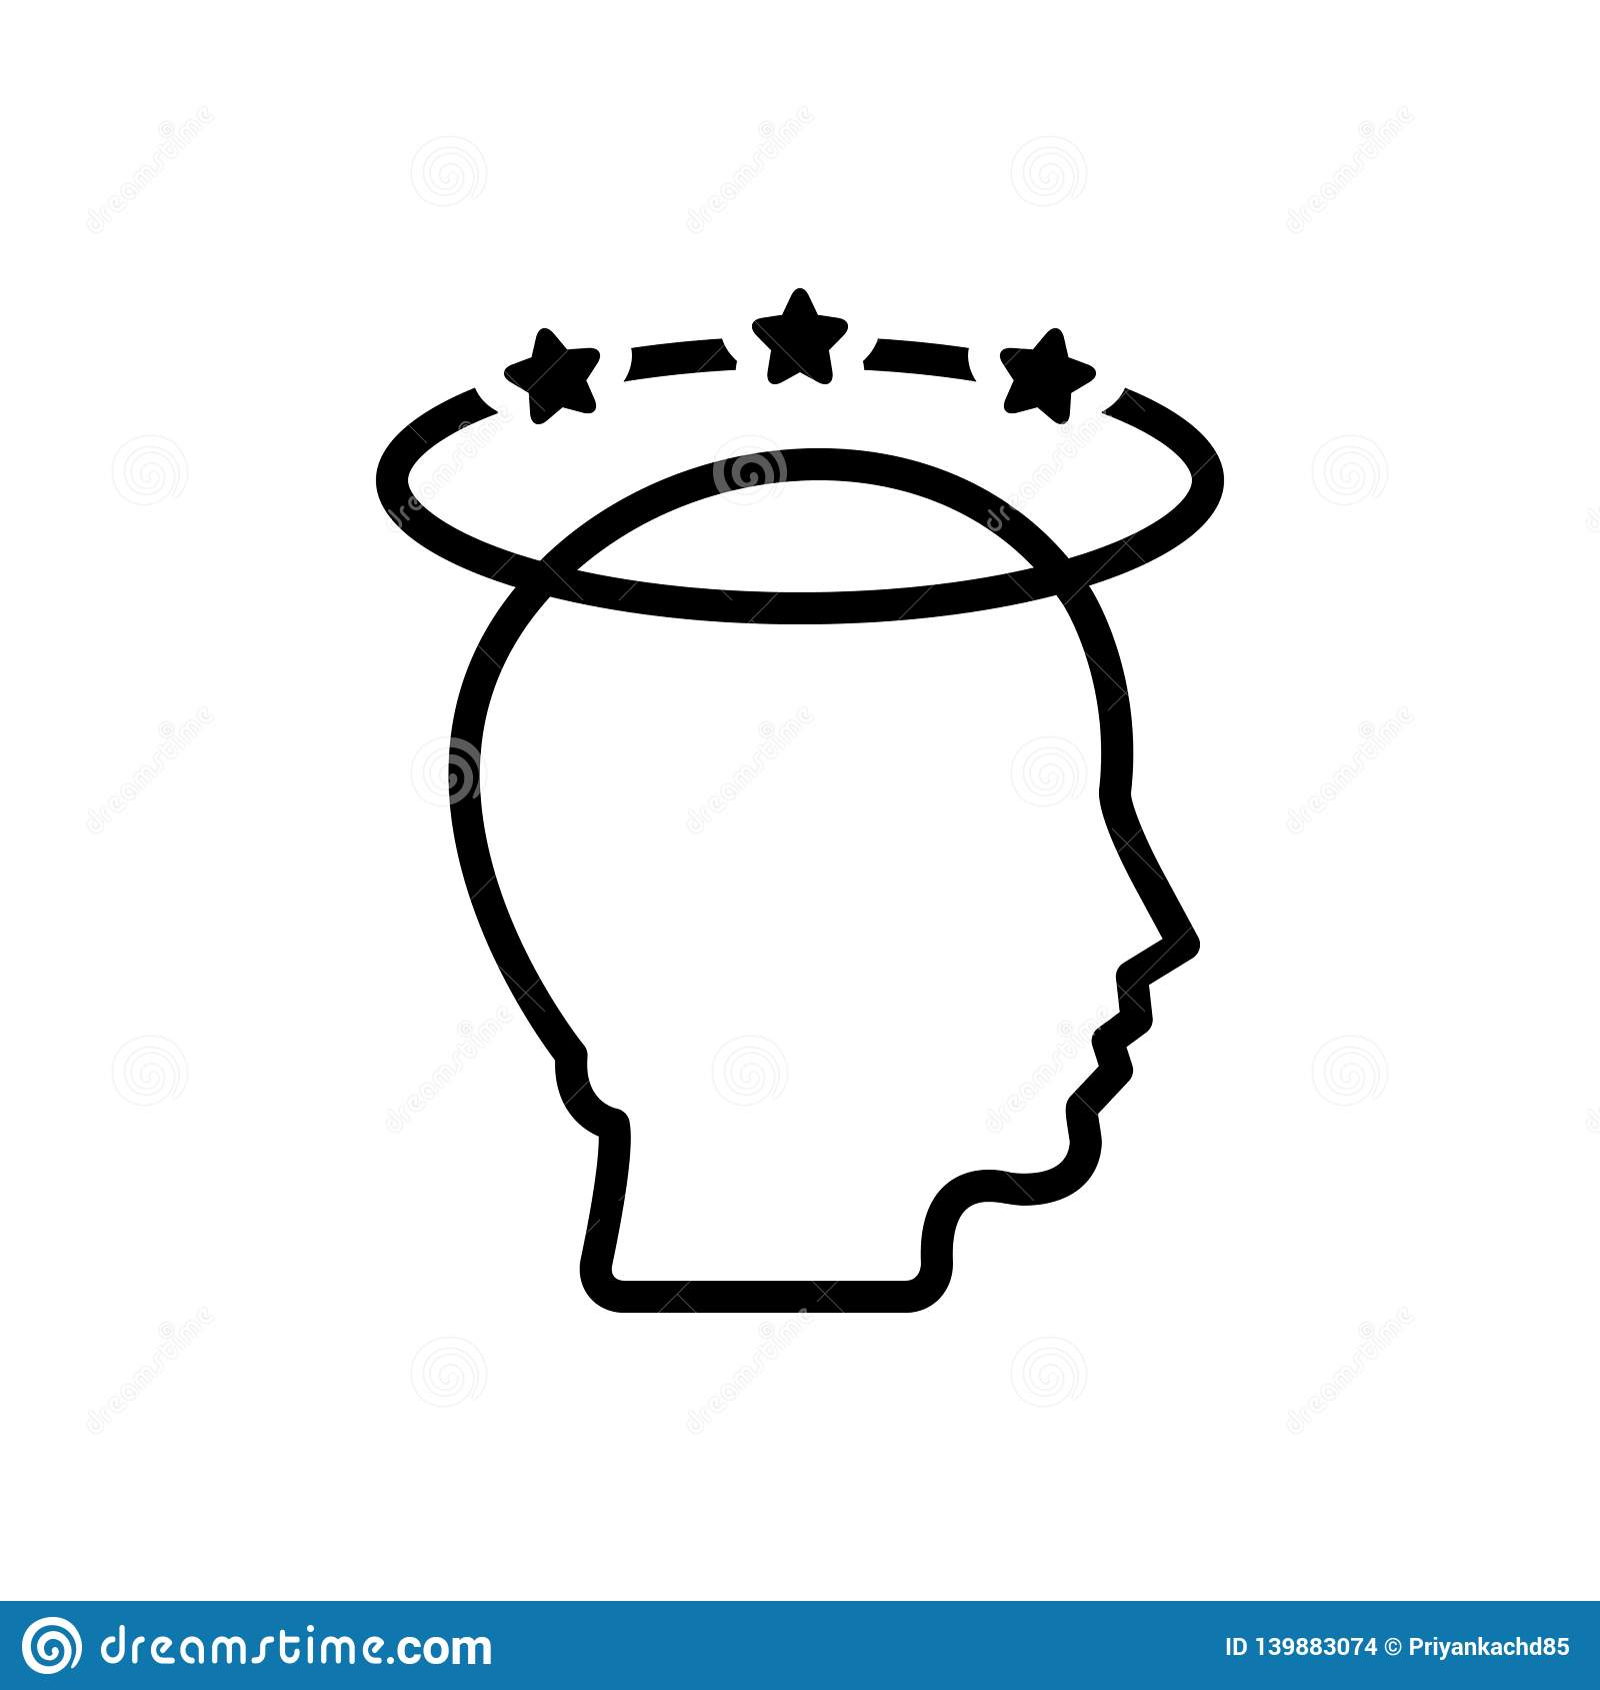 Black line icon for Depression, migraine and stress